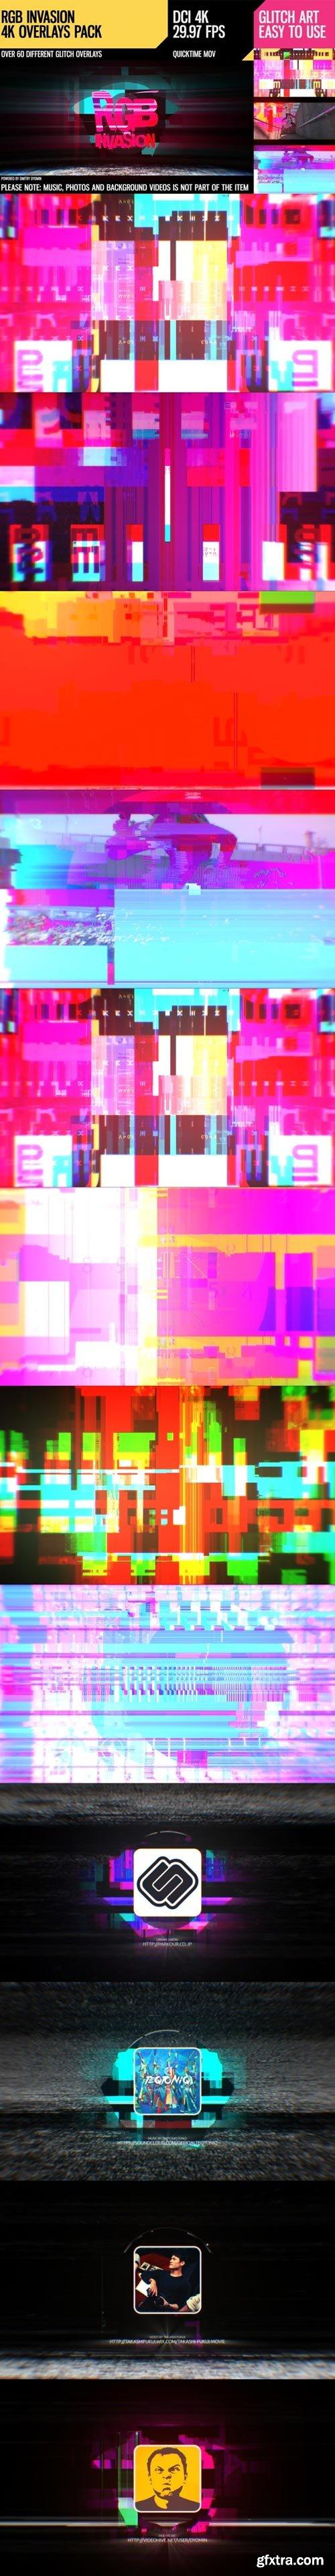 Videohive - RGB Invasion (4K Overlays Pack) - 19509295